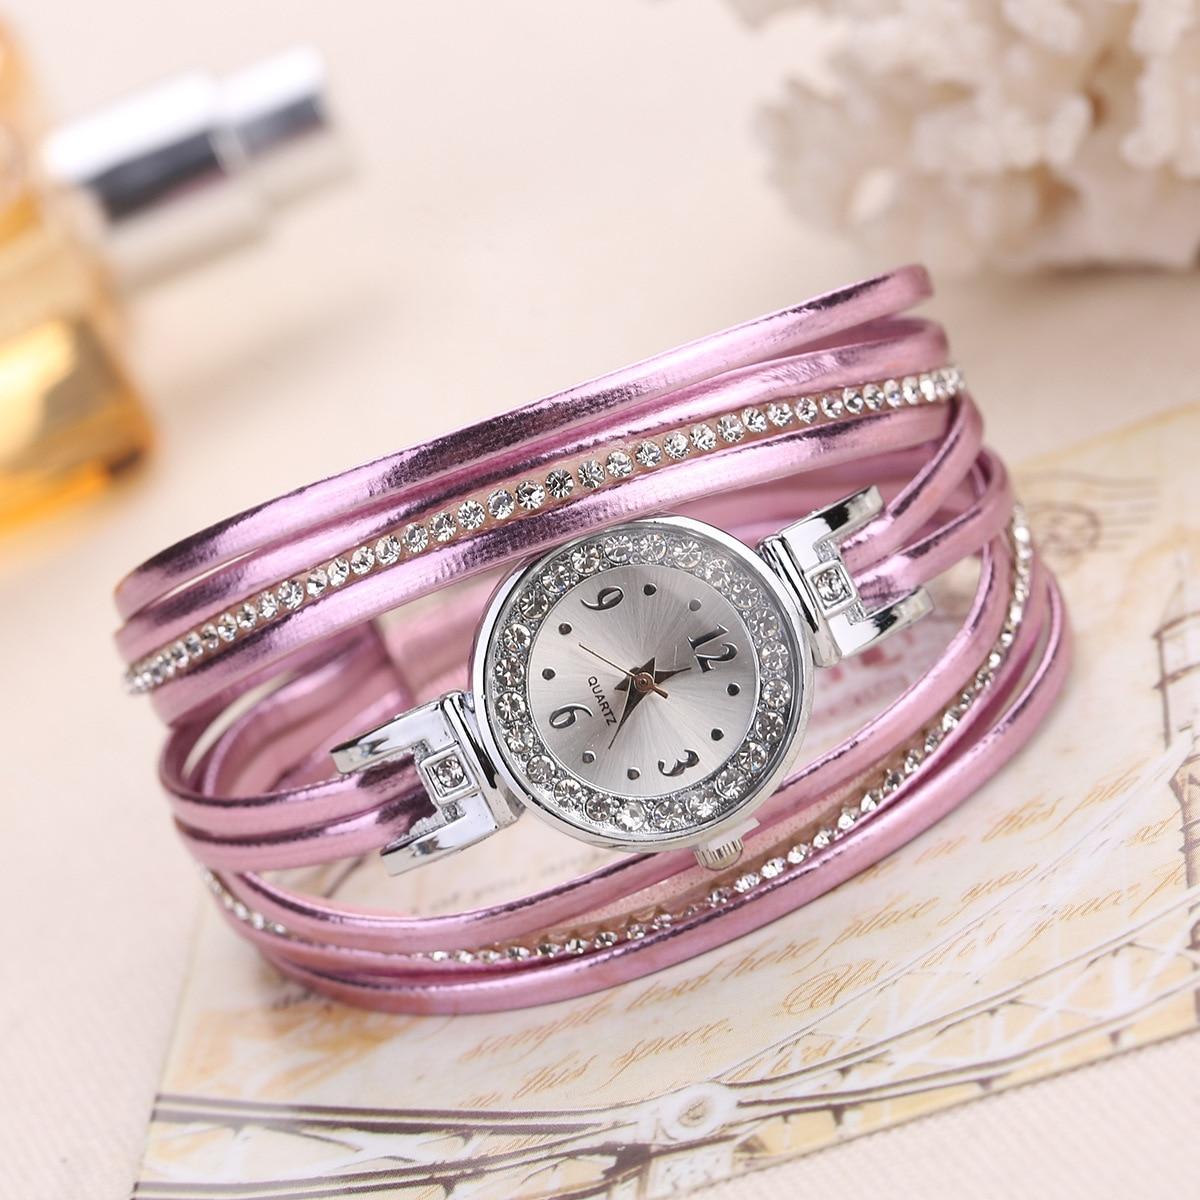 2020 New Arrival Women Luxury Crystal Bracelet Watch Gold Leather Thin Strap Dress Wristwatch Casual Ladies Quartz Clock Ceasuri